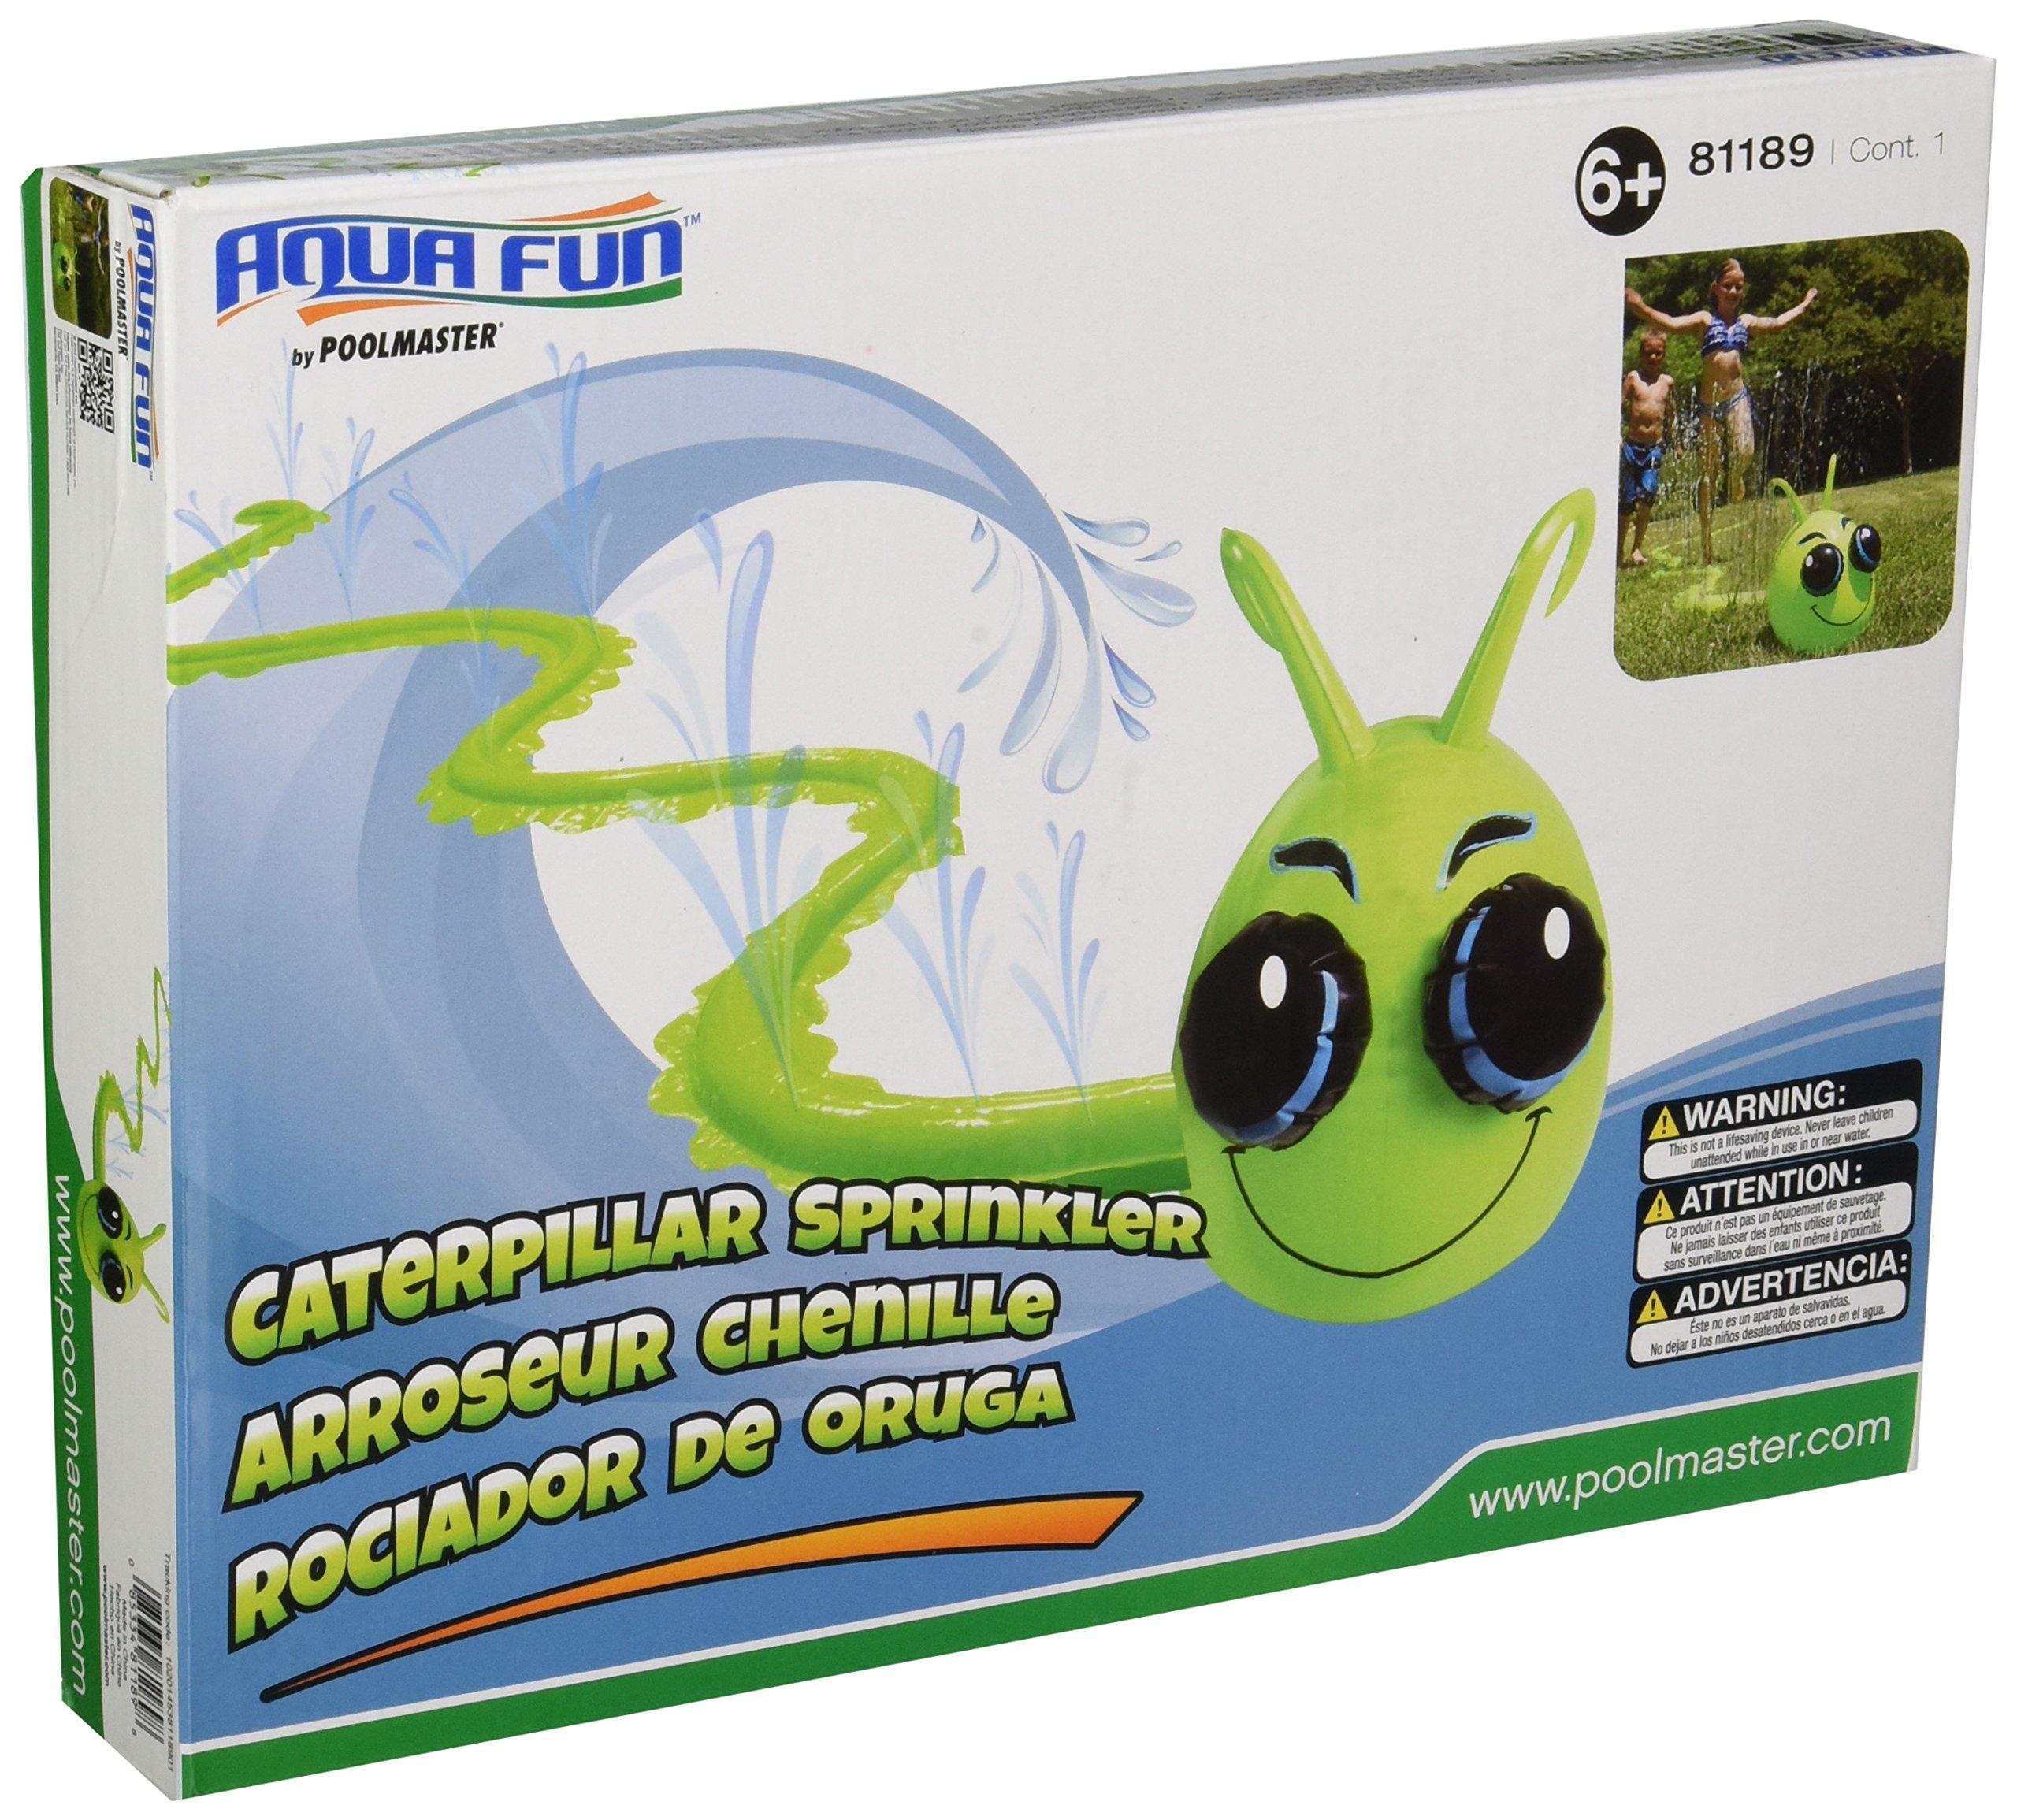 Poolmaster Caterpillar Sprinkler Toy